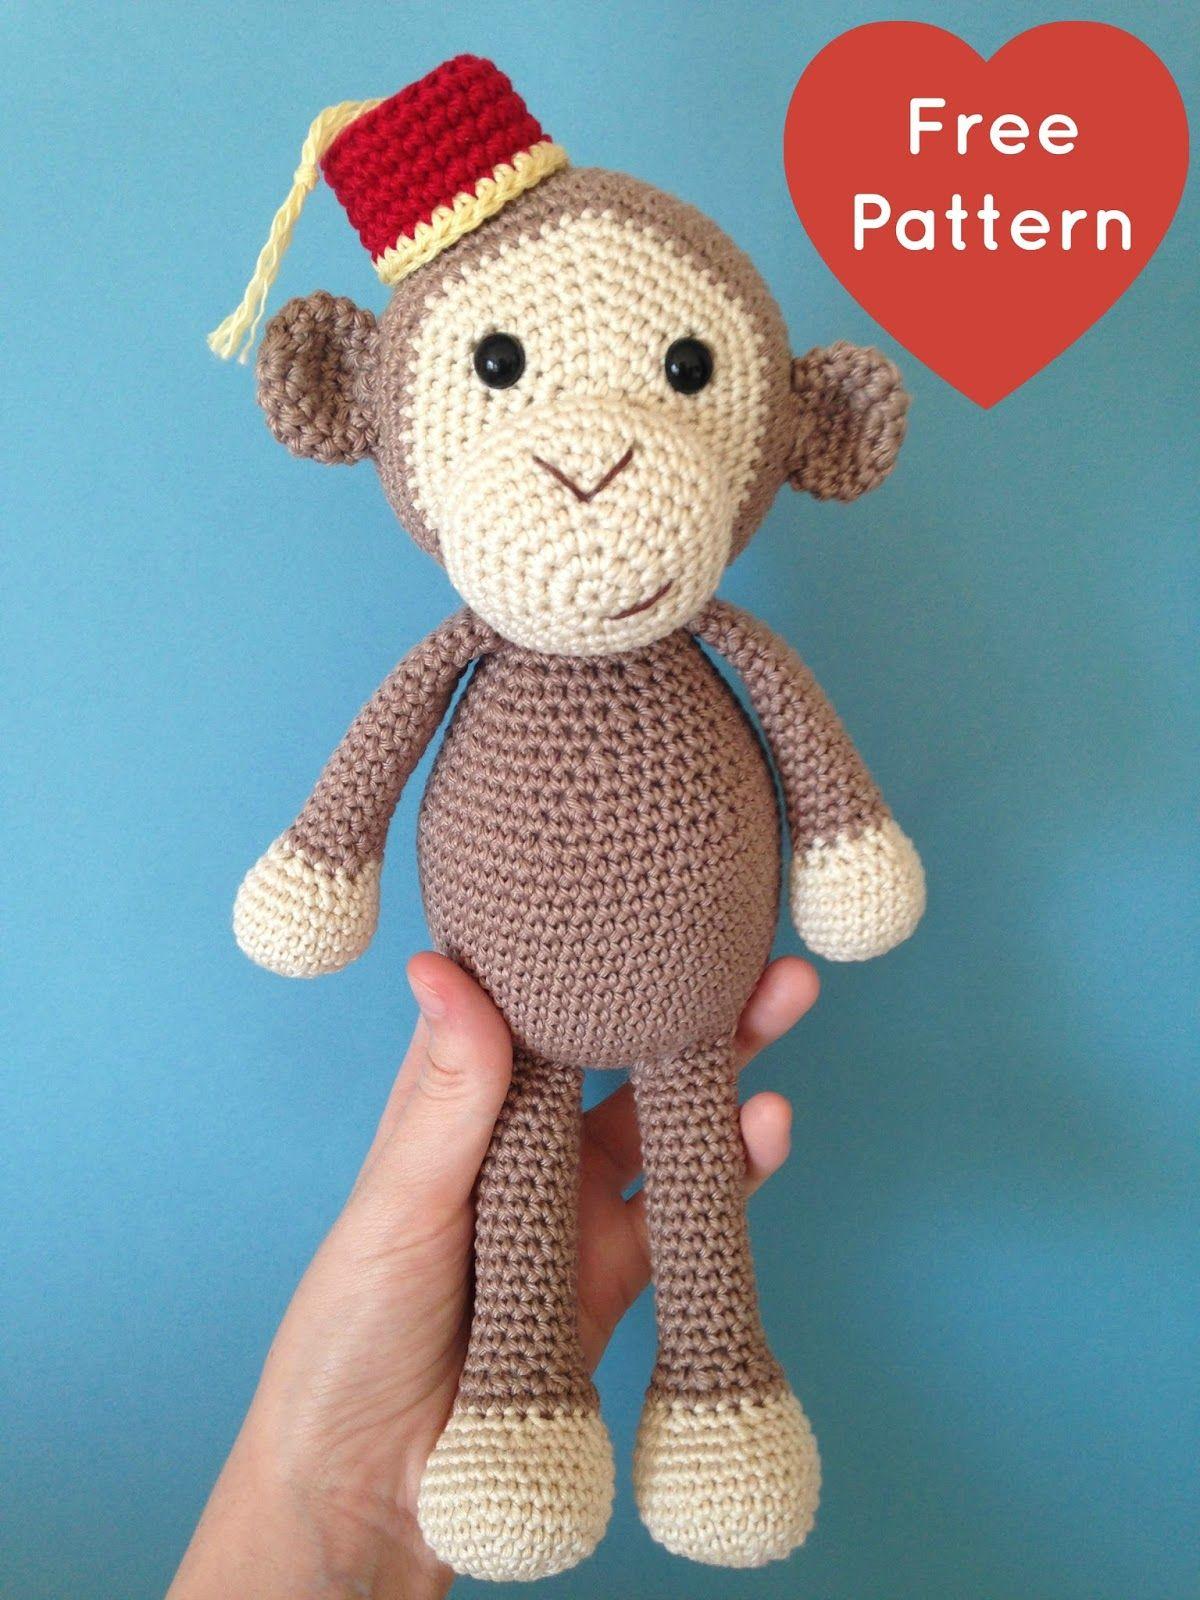 PrintFriendly.com: Print web pages, create PDFs | Crocheting ...